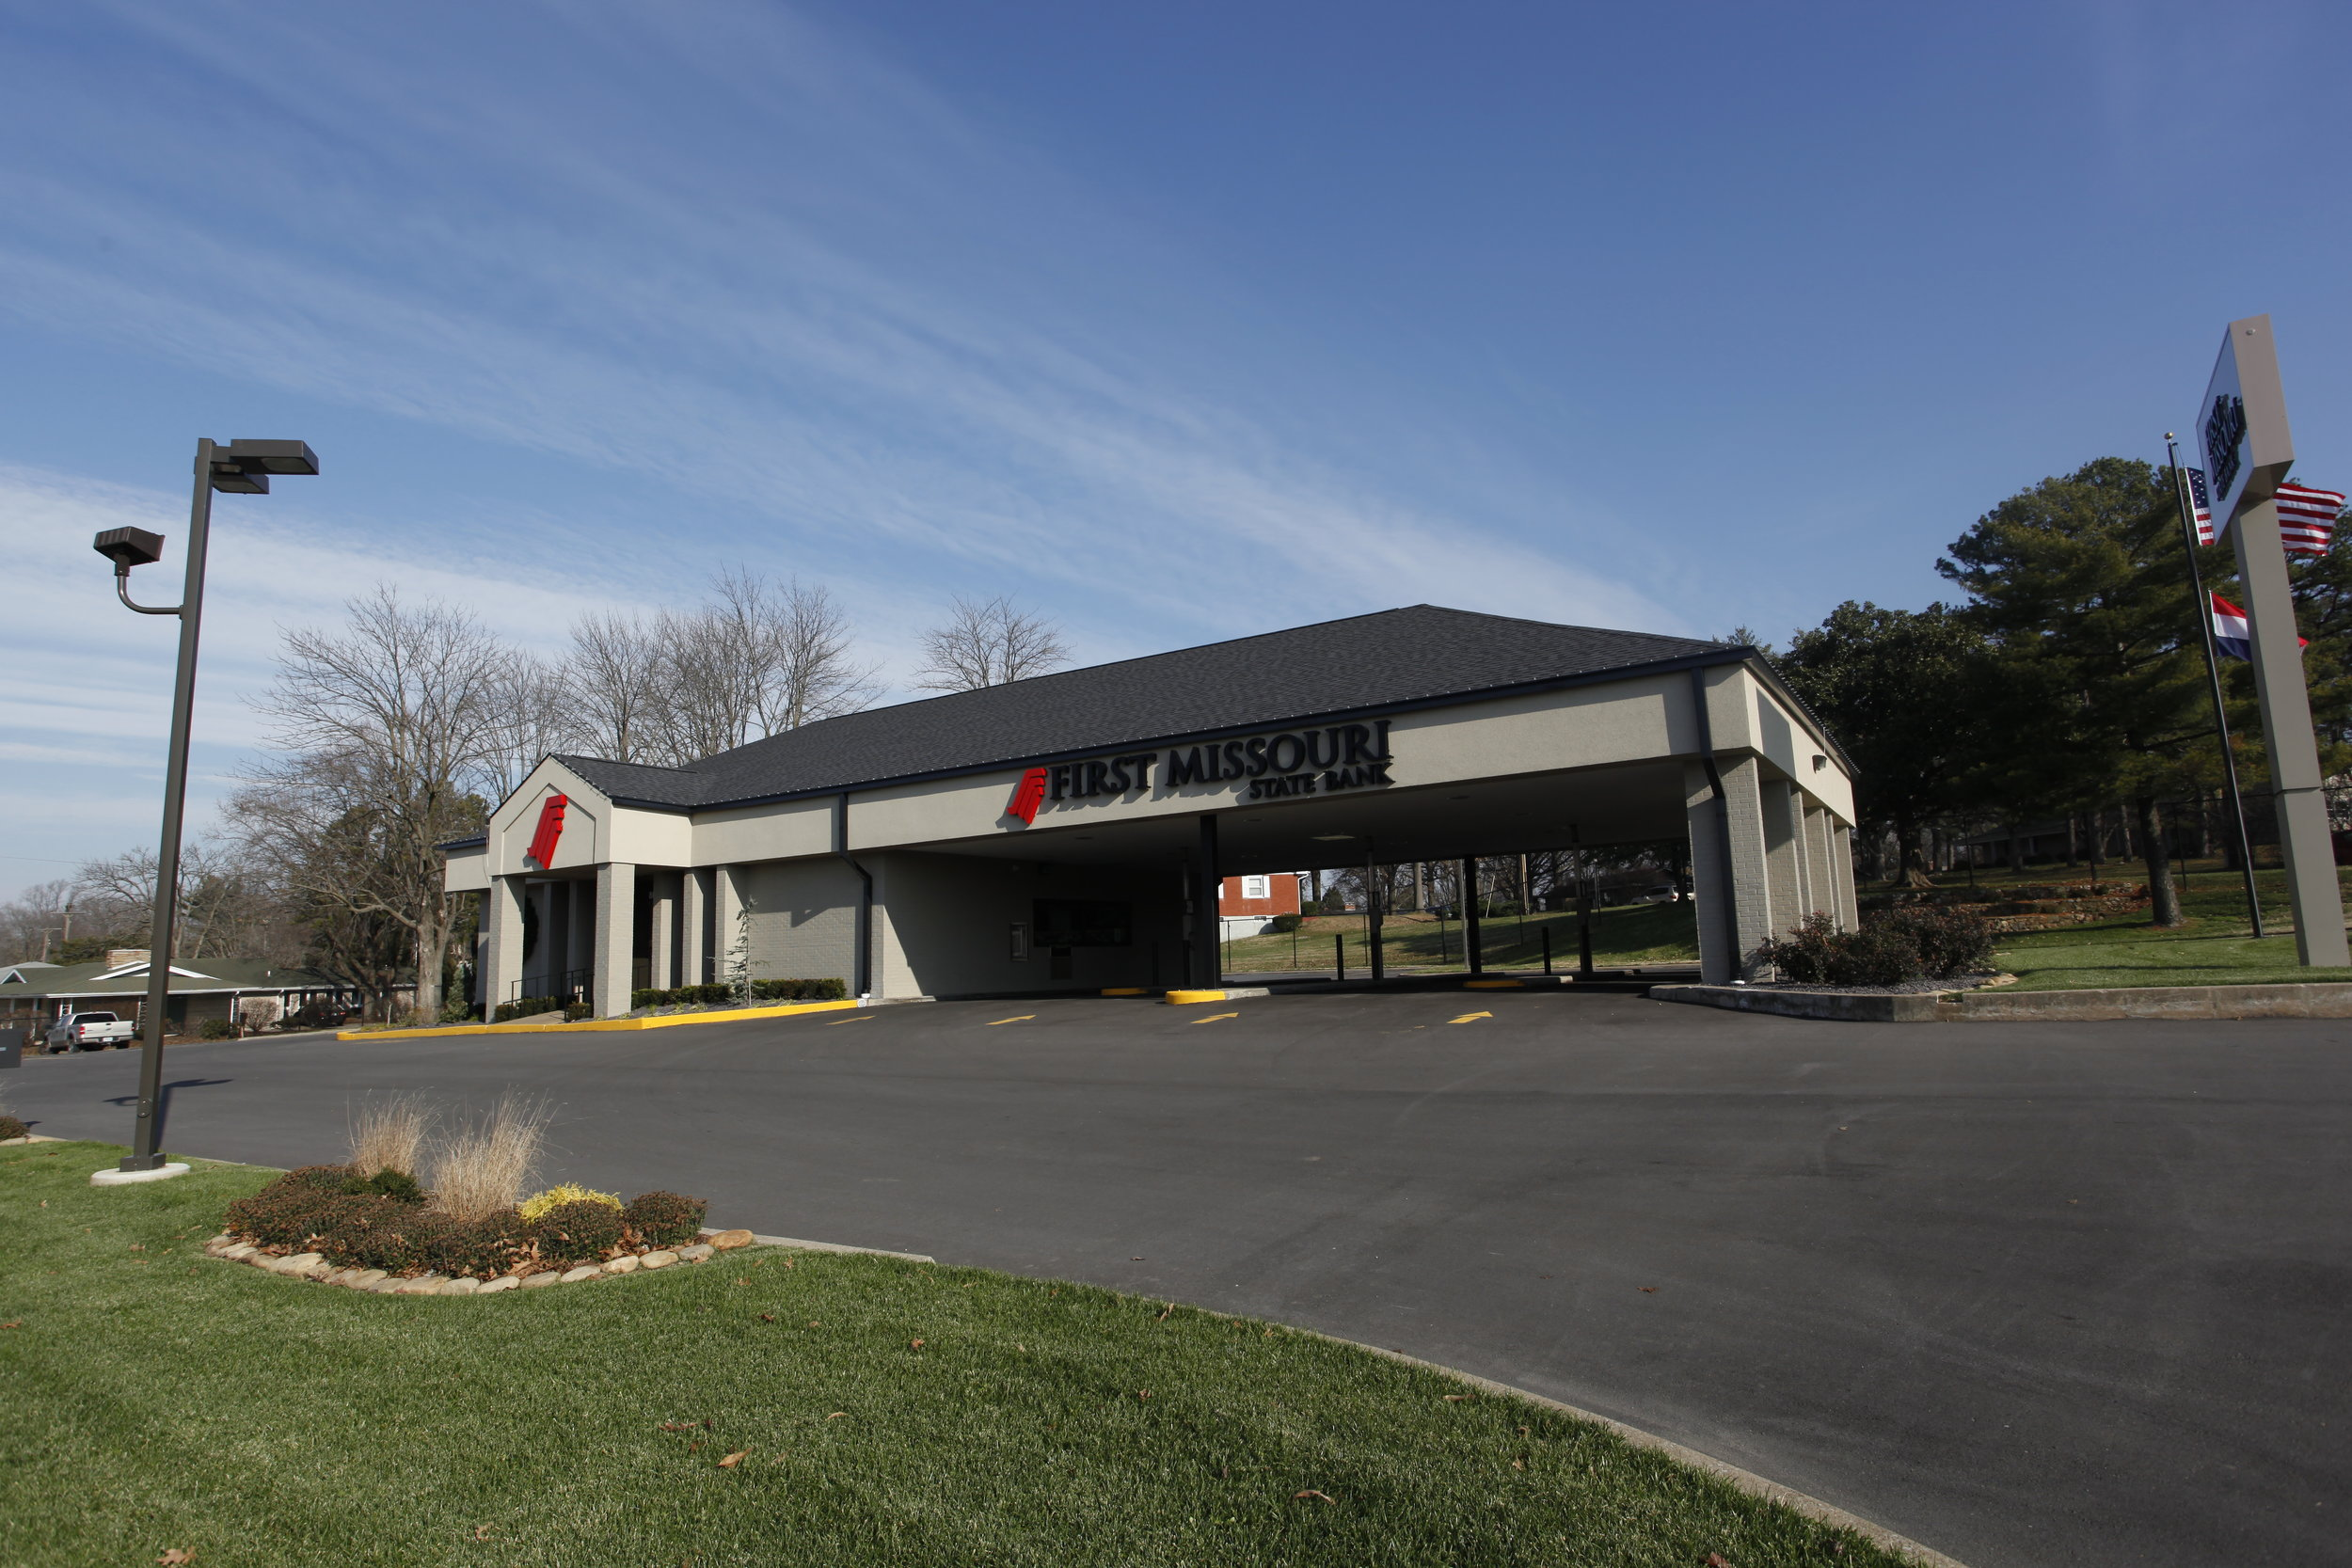 First Missouri State Bank - Cape Girardeau, Missouri